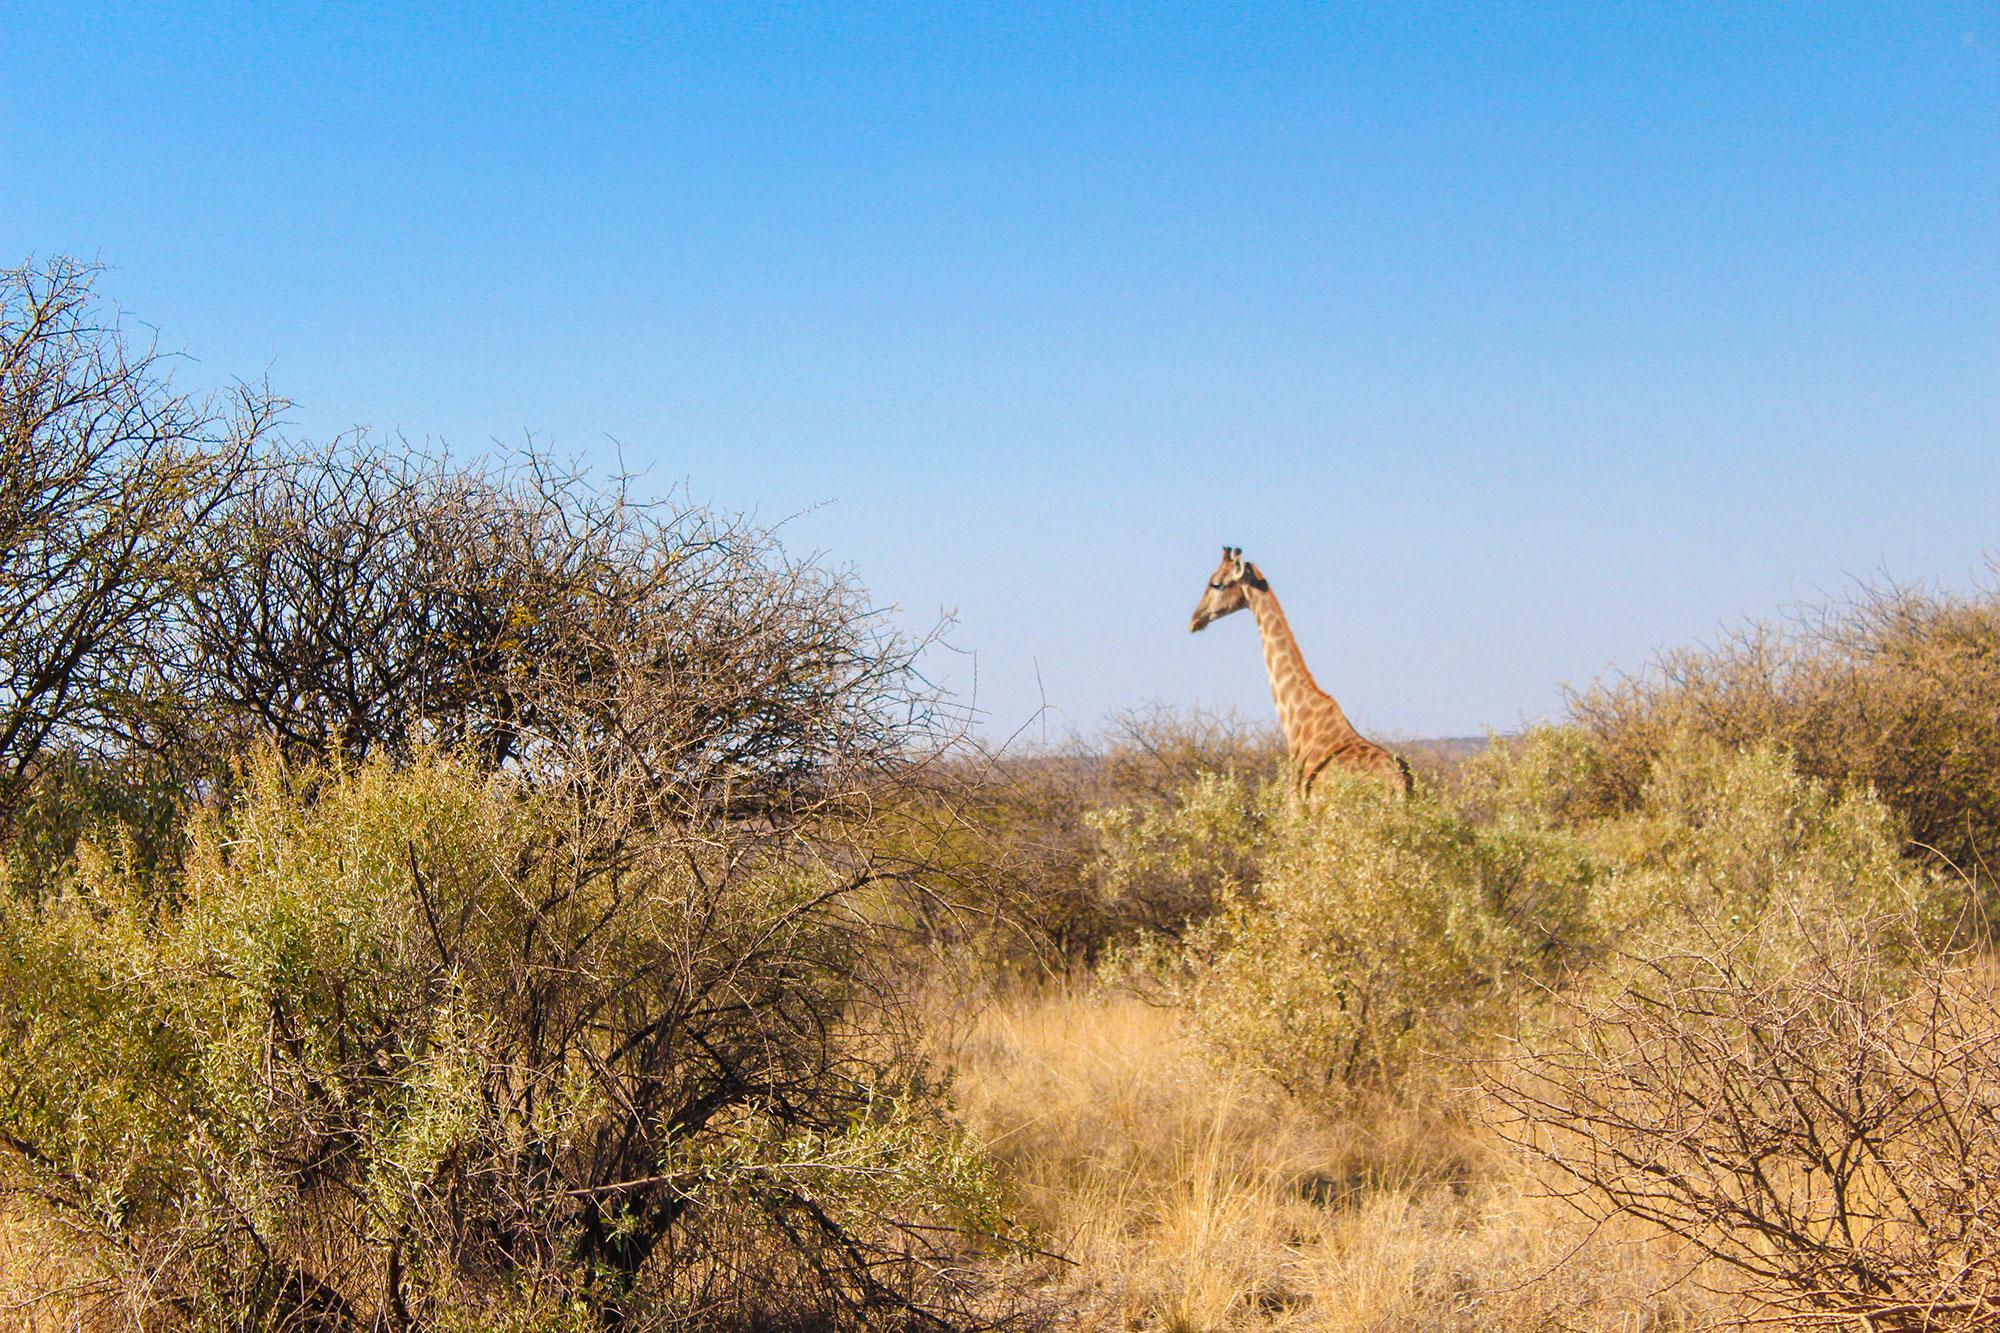 Giraffe at Naankuse Wildlife Sanctuary Namibia